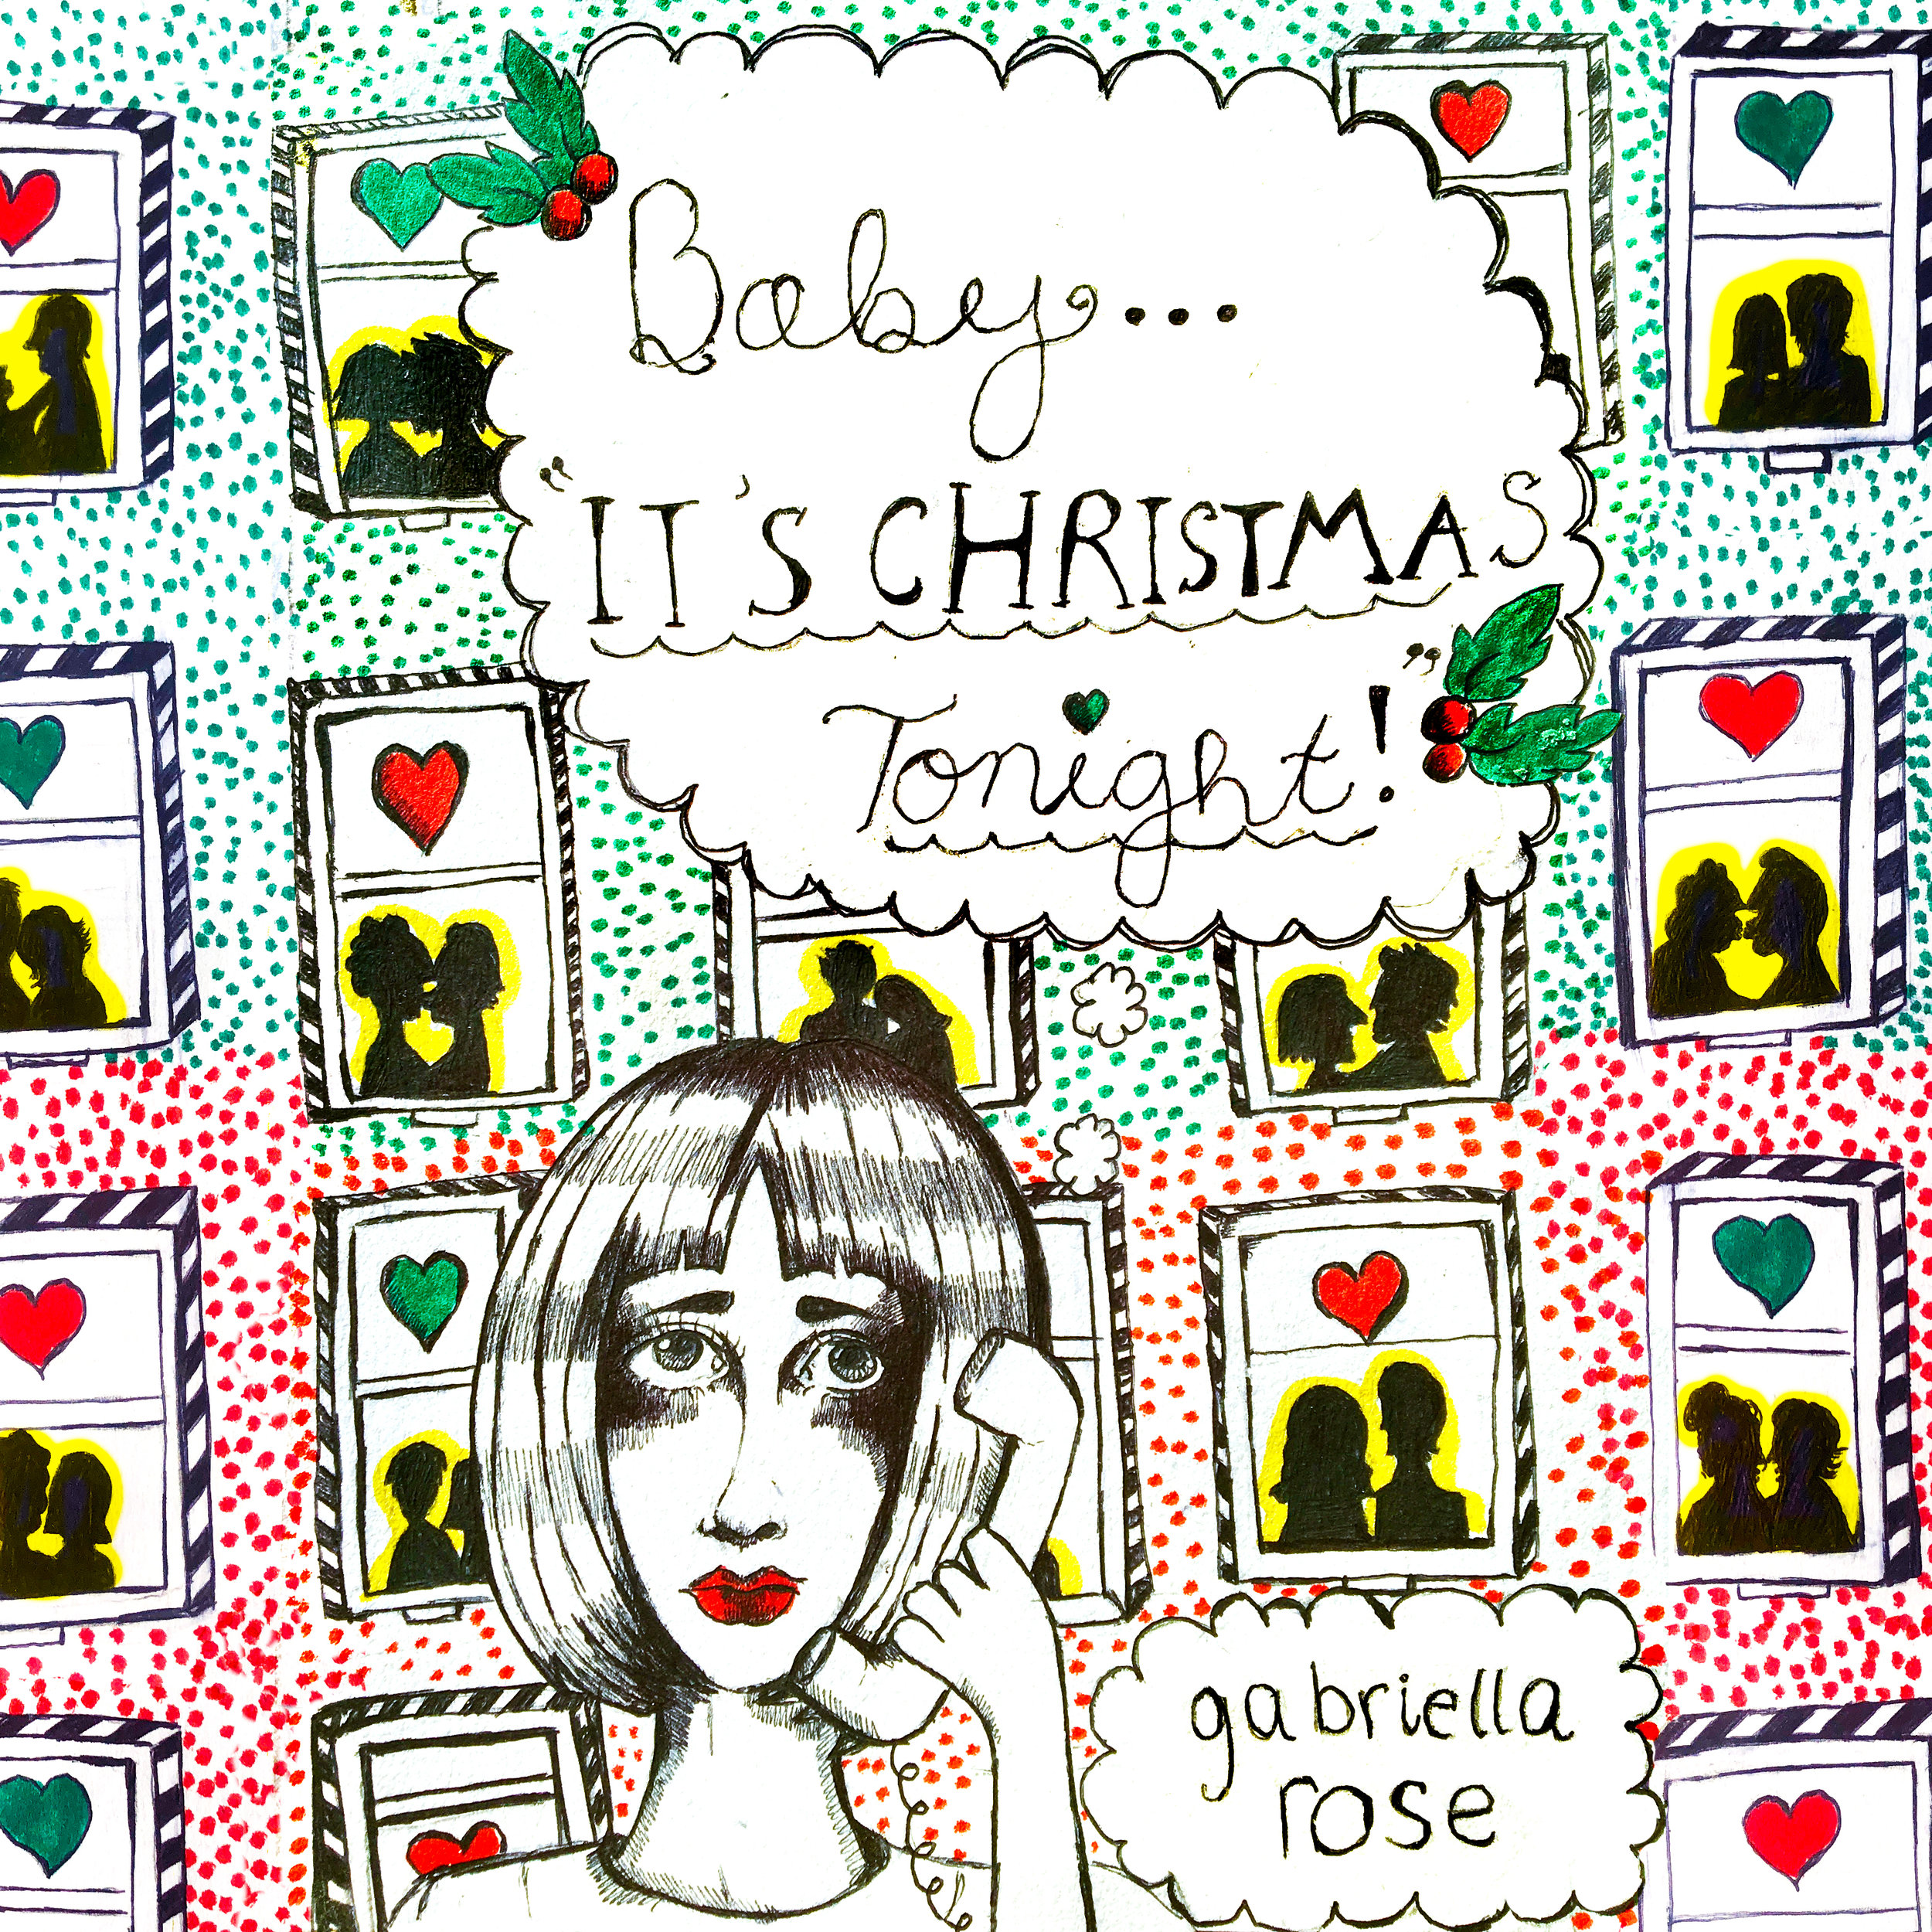 It's-Christmas-Tonight-EP-Artwork.jpg